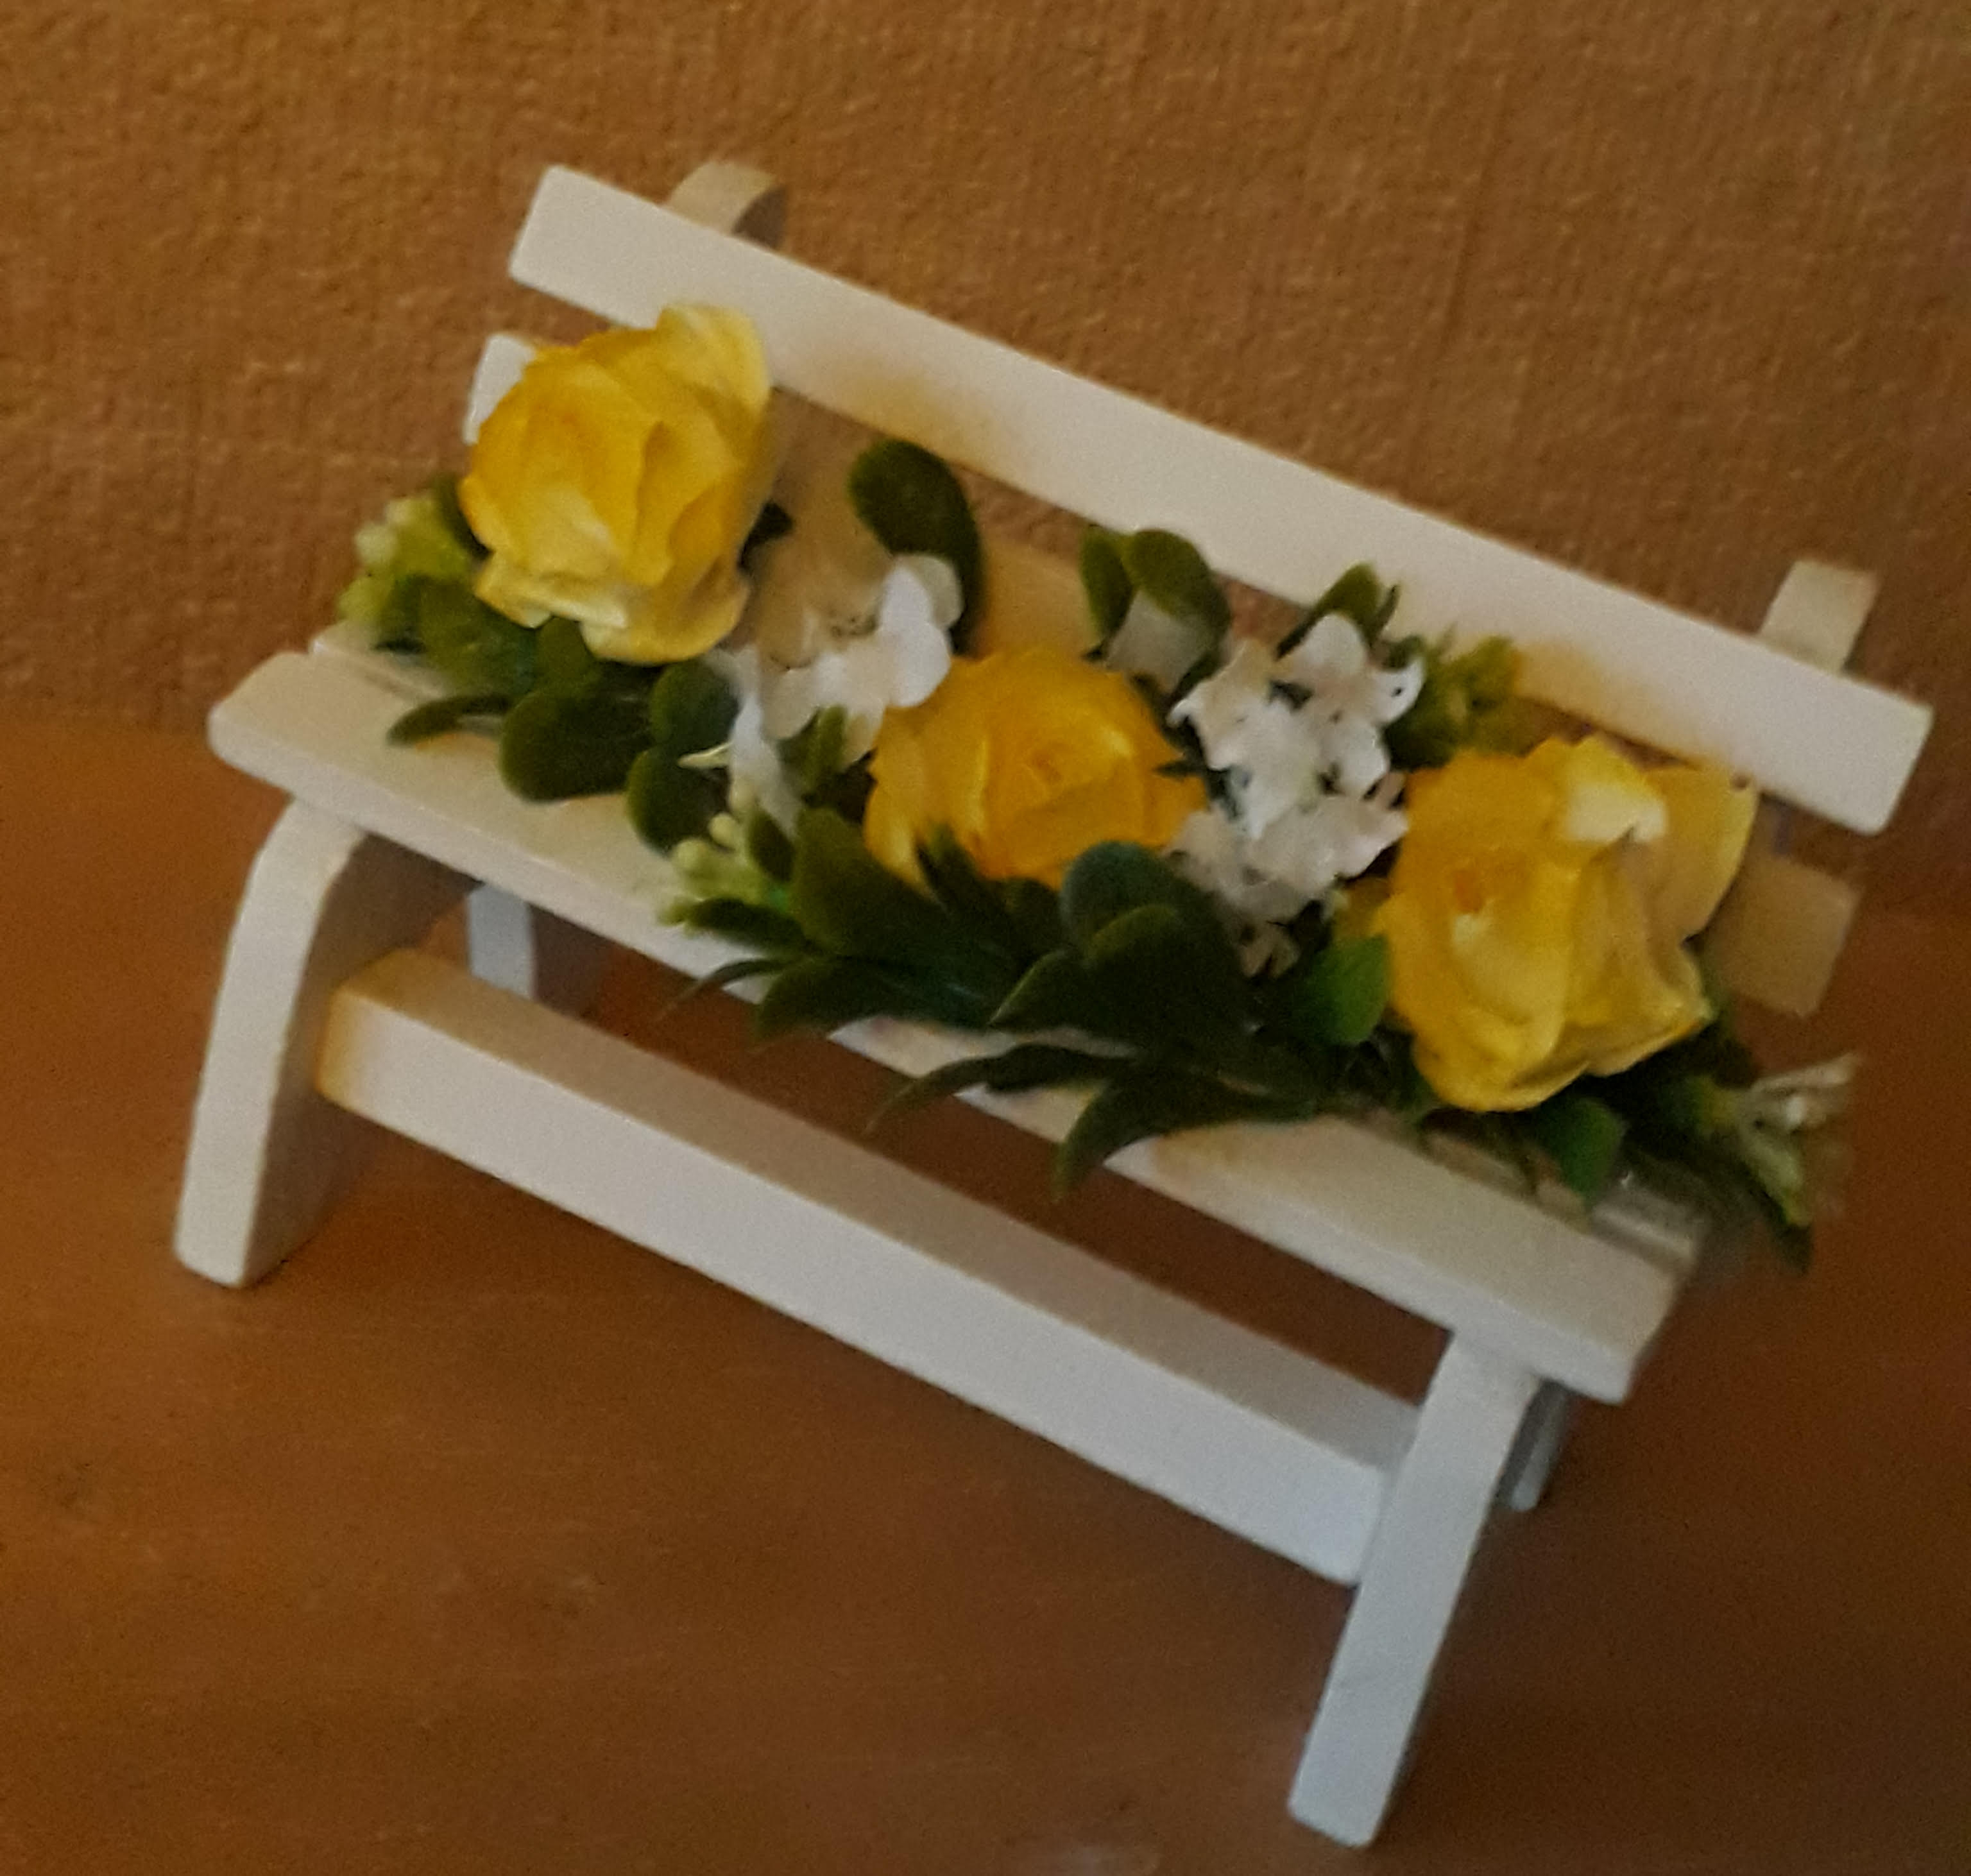 white mini bench baby miscarriage graveside or garden urn lemon artificial flowers